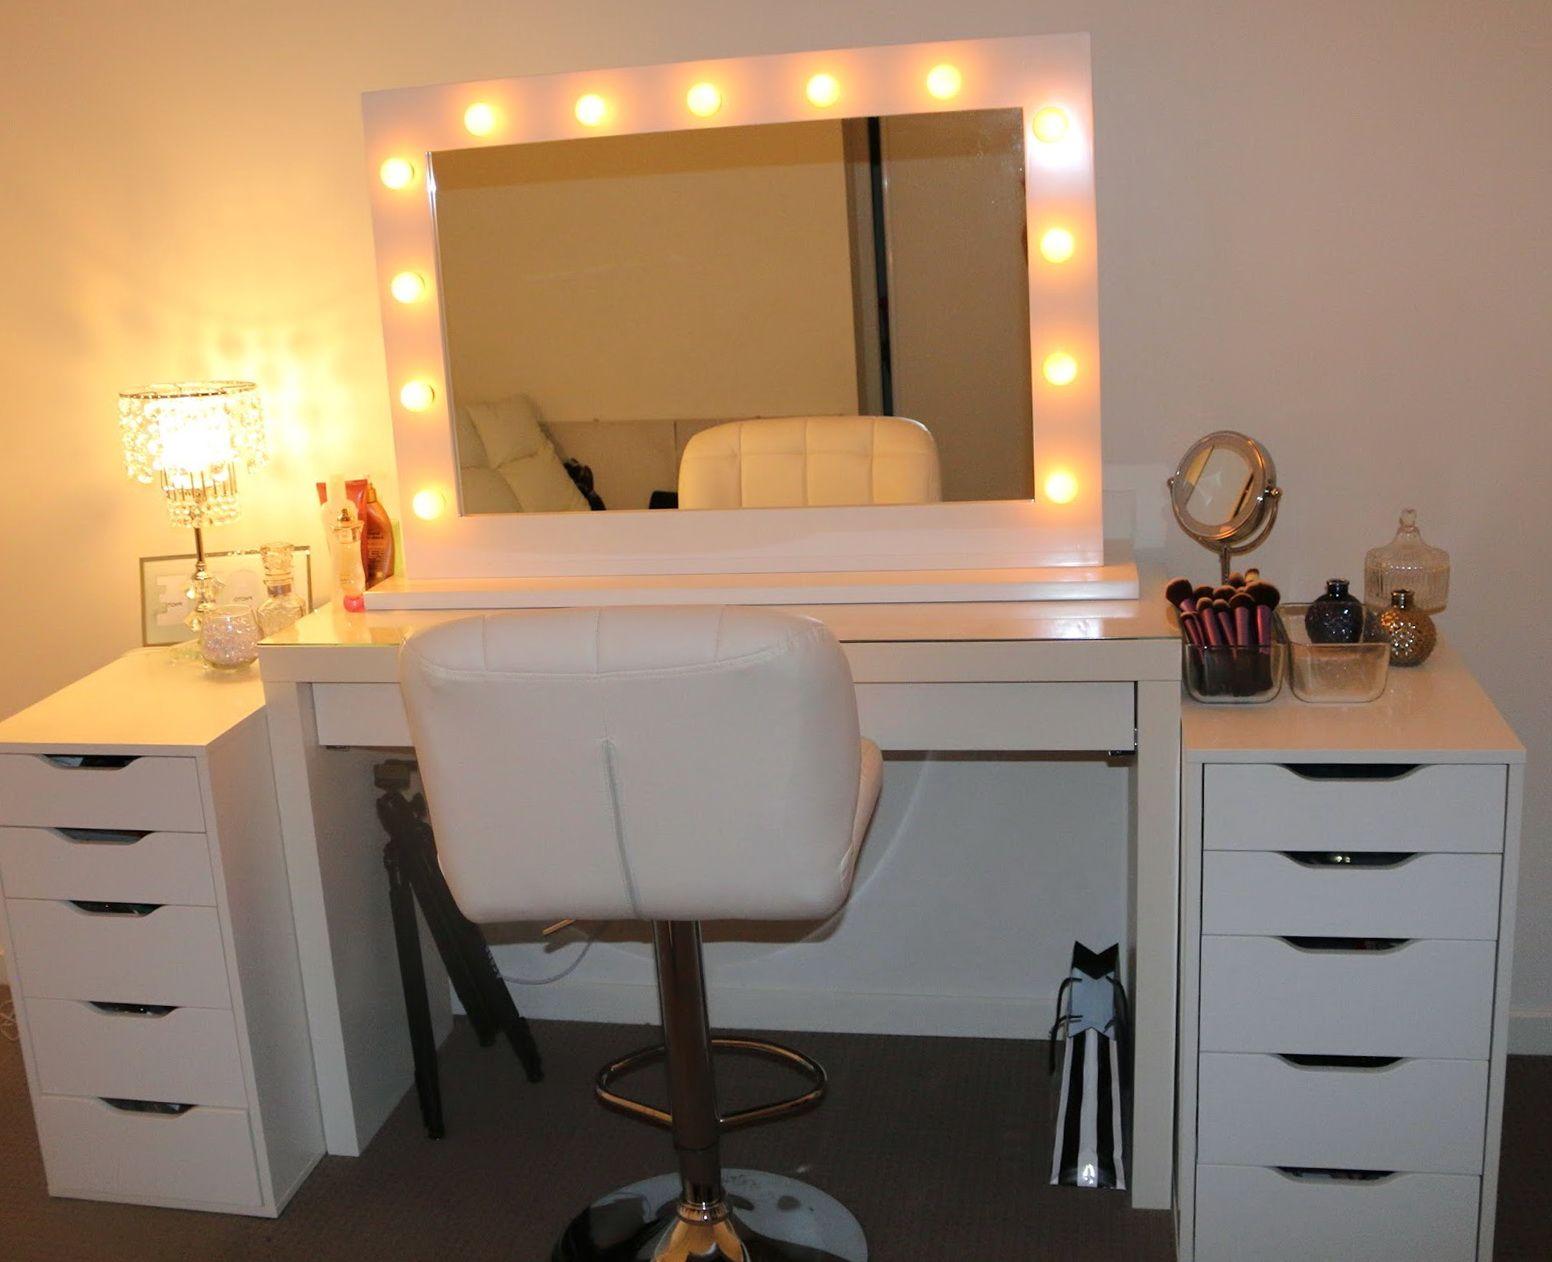 Bedroom : Awesome Makeup Vanity Set Ikea Vanity Mirror With Lights Ikea' Makeup  Vanity Table' Makeup Tables and Bedrooms - Modern Makeup Vanity - Google Search Make Up Pinterest